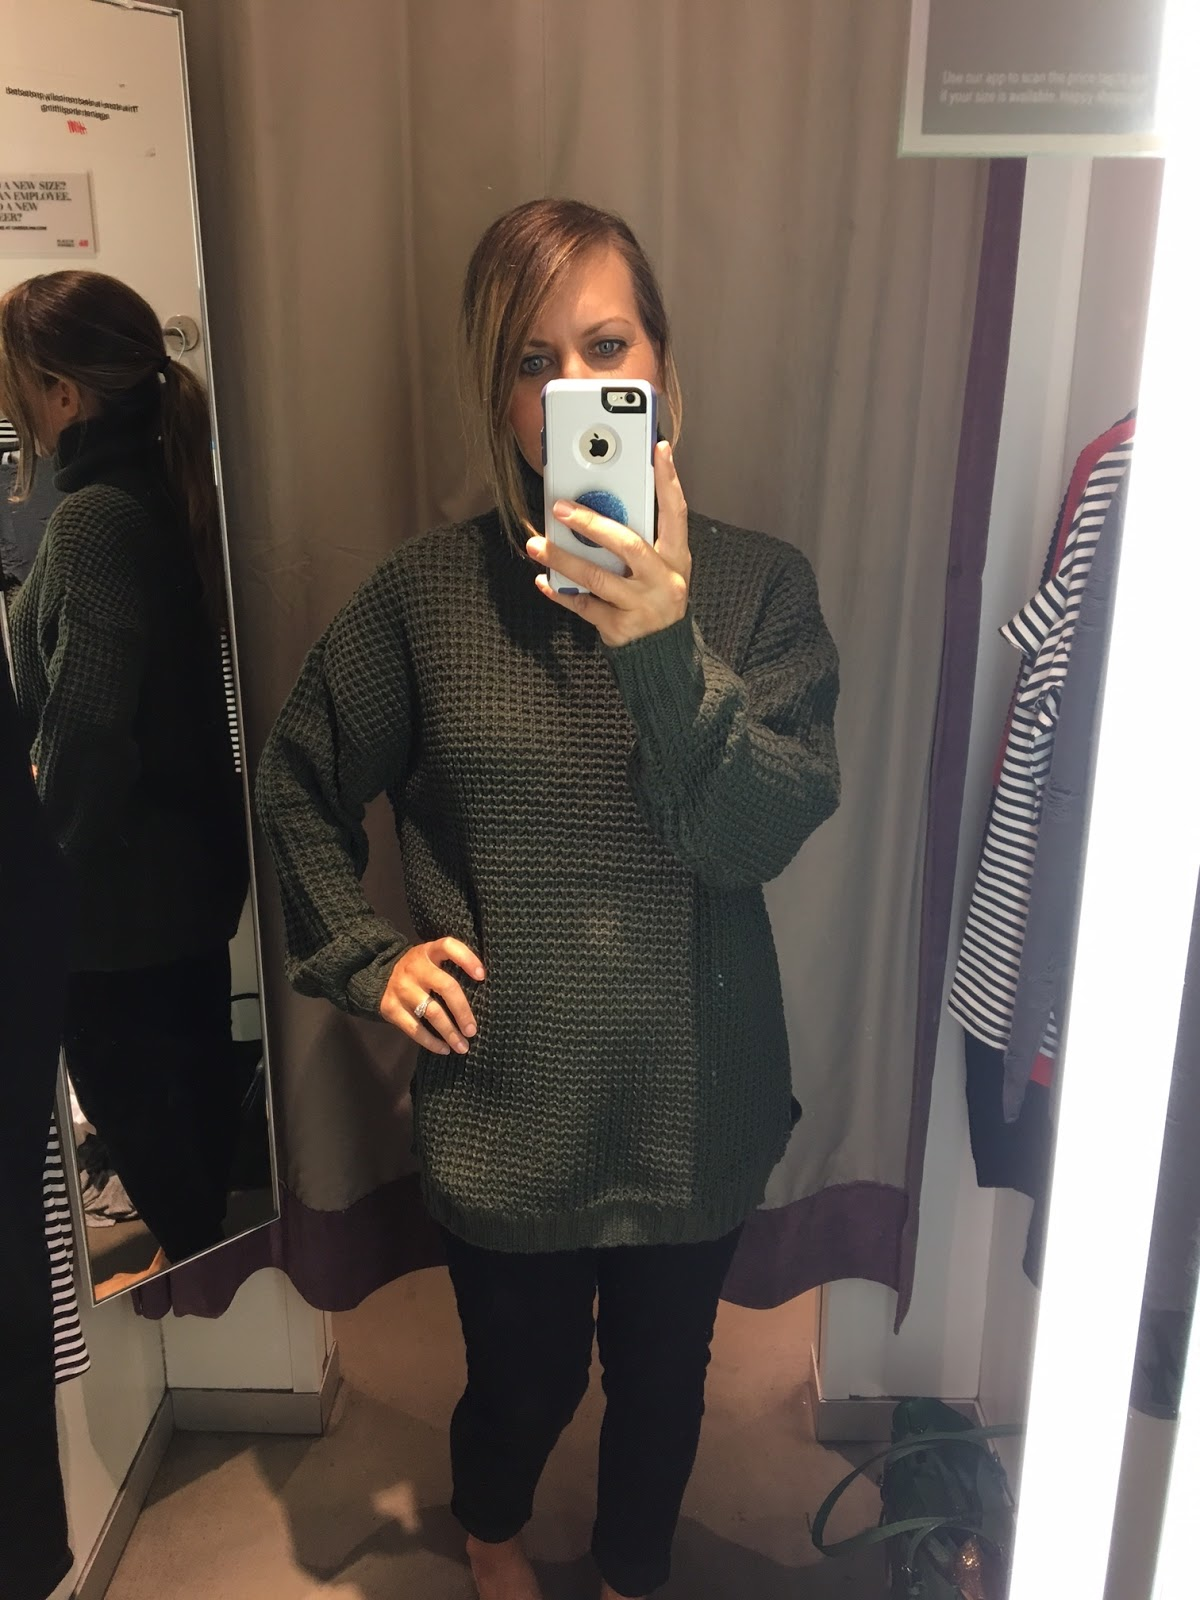 midwestern mama 2017 #2: h 2526m 2boversized 2bhunter 2bgreen 2bsweater